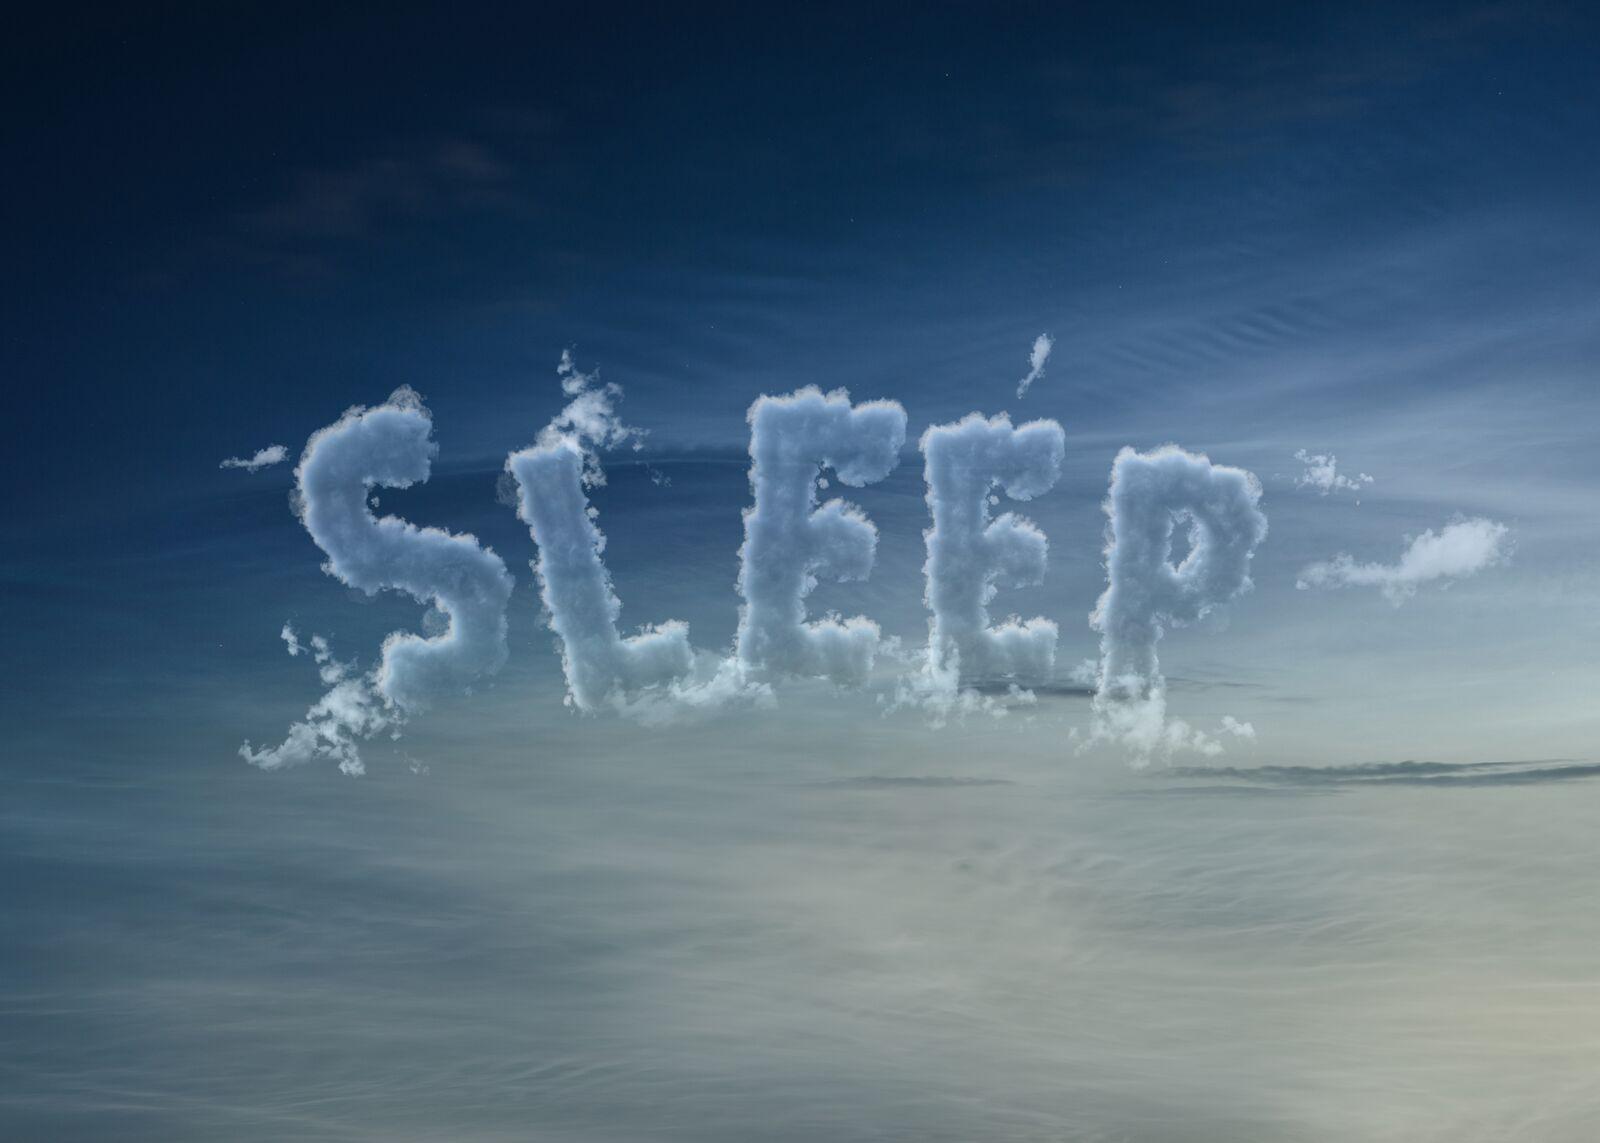 Sleep Creative Clouds Lettering